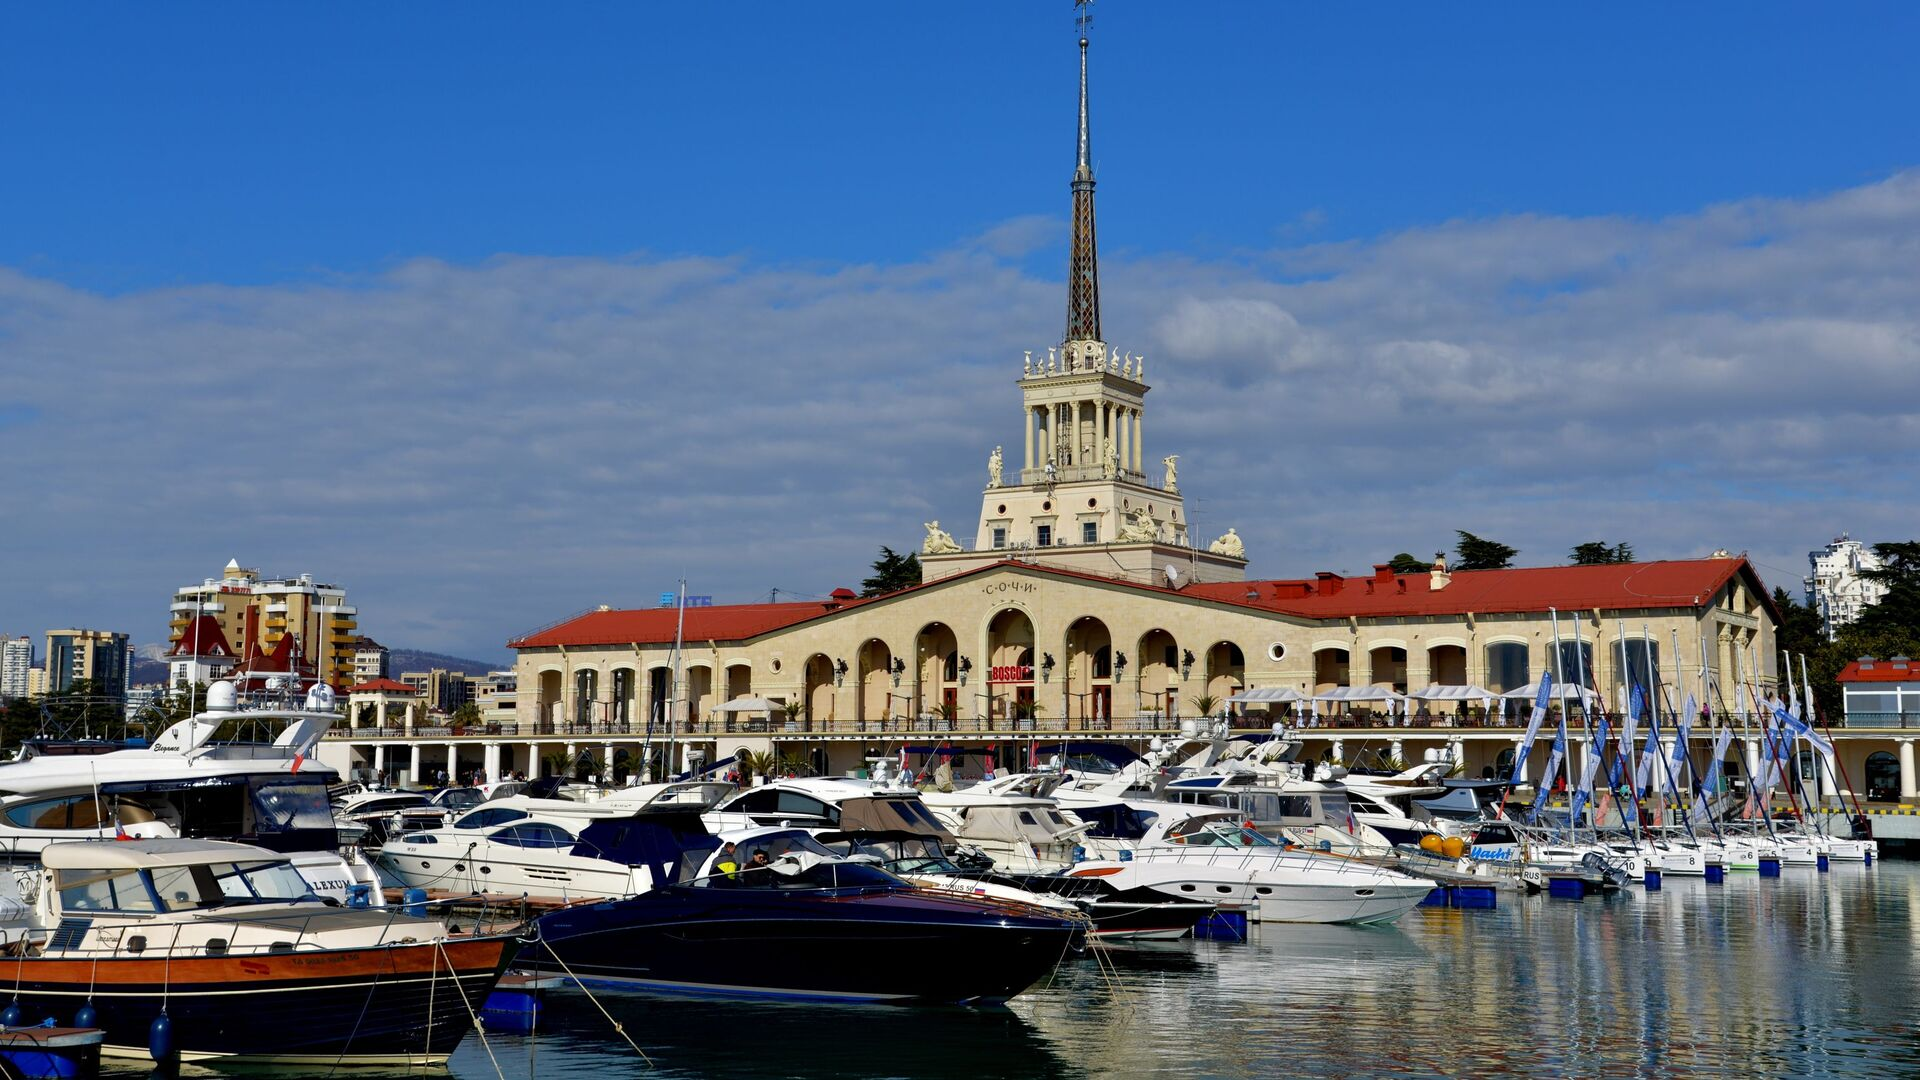 Вид на здание морского порта в Сочи - РИА Новости, 1920, 21.10.2020